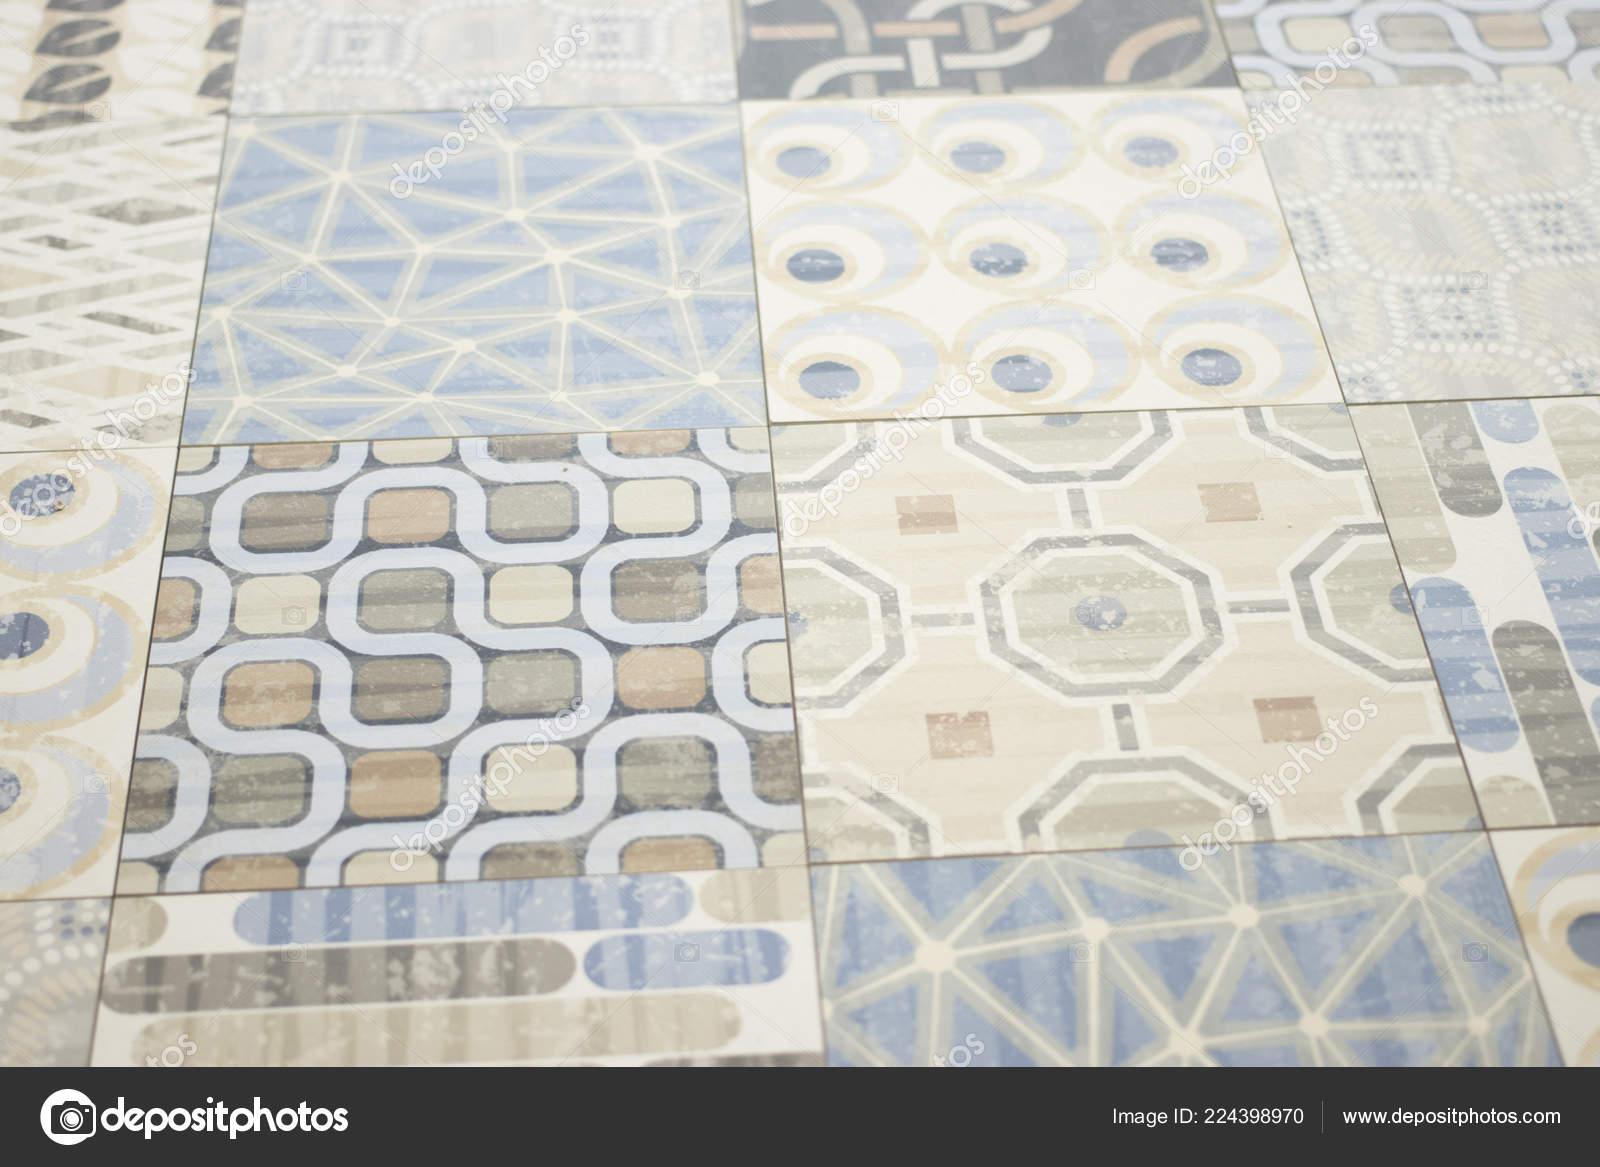 kitchen bathroom tiles showroom display new tiling option floors walls stock photo image by c edwardolive 224398970